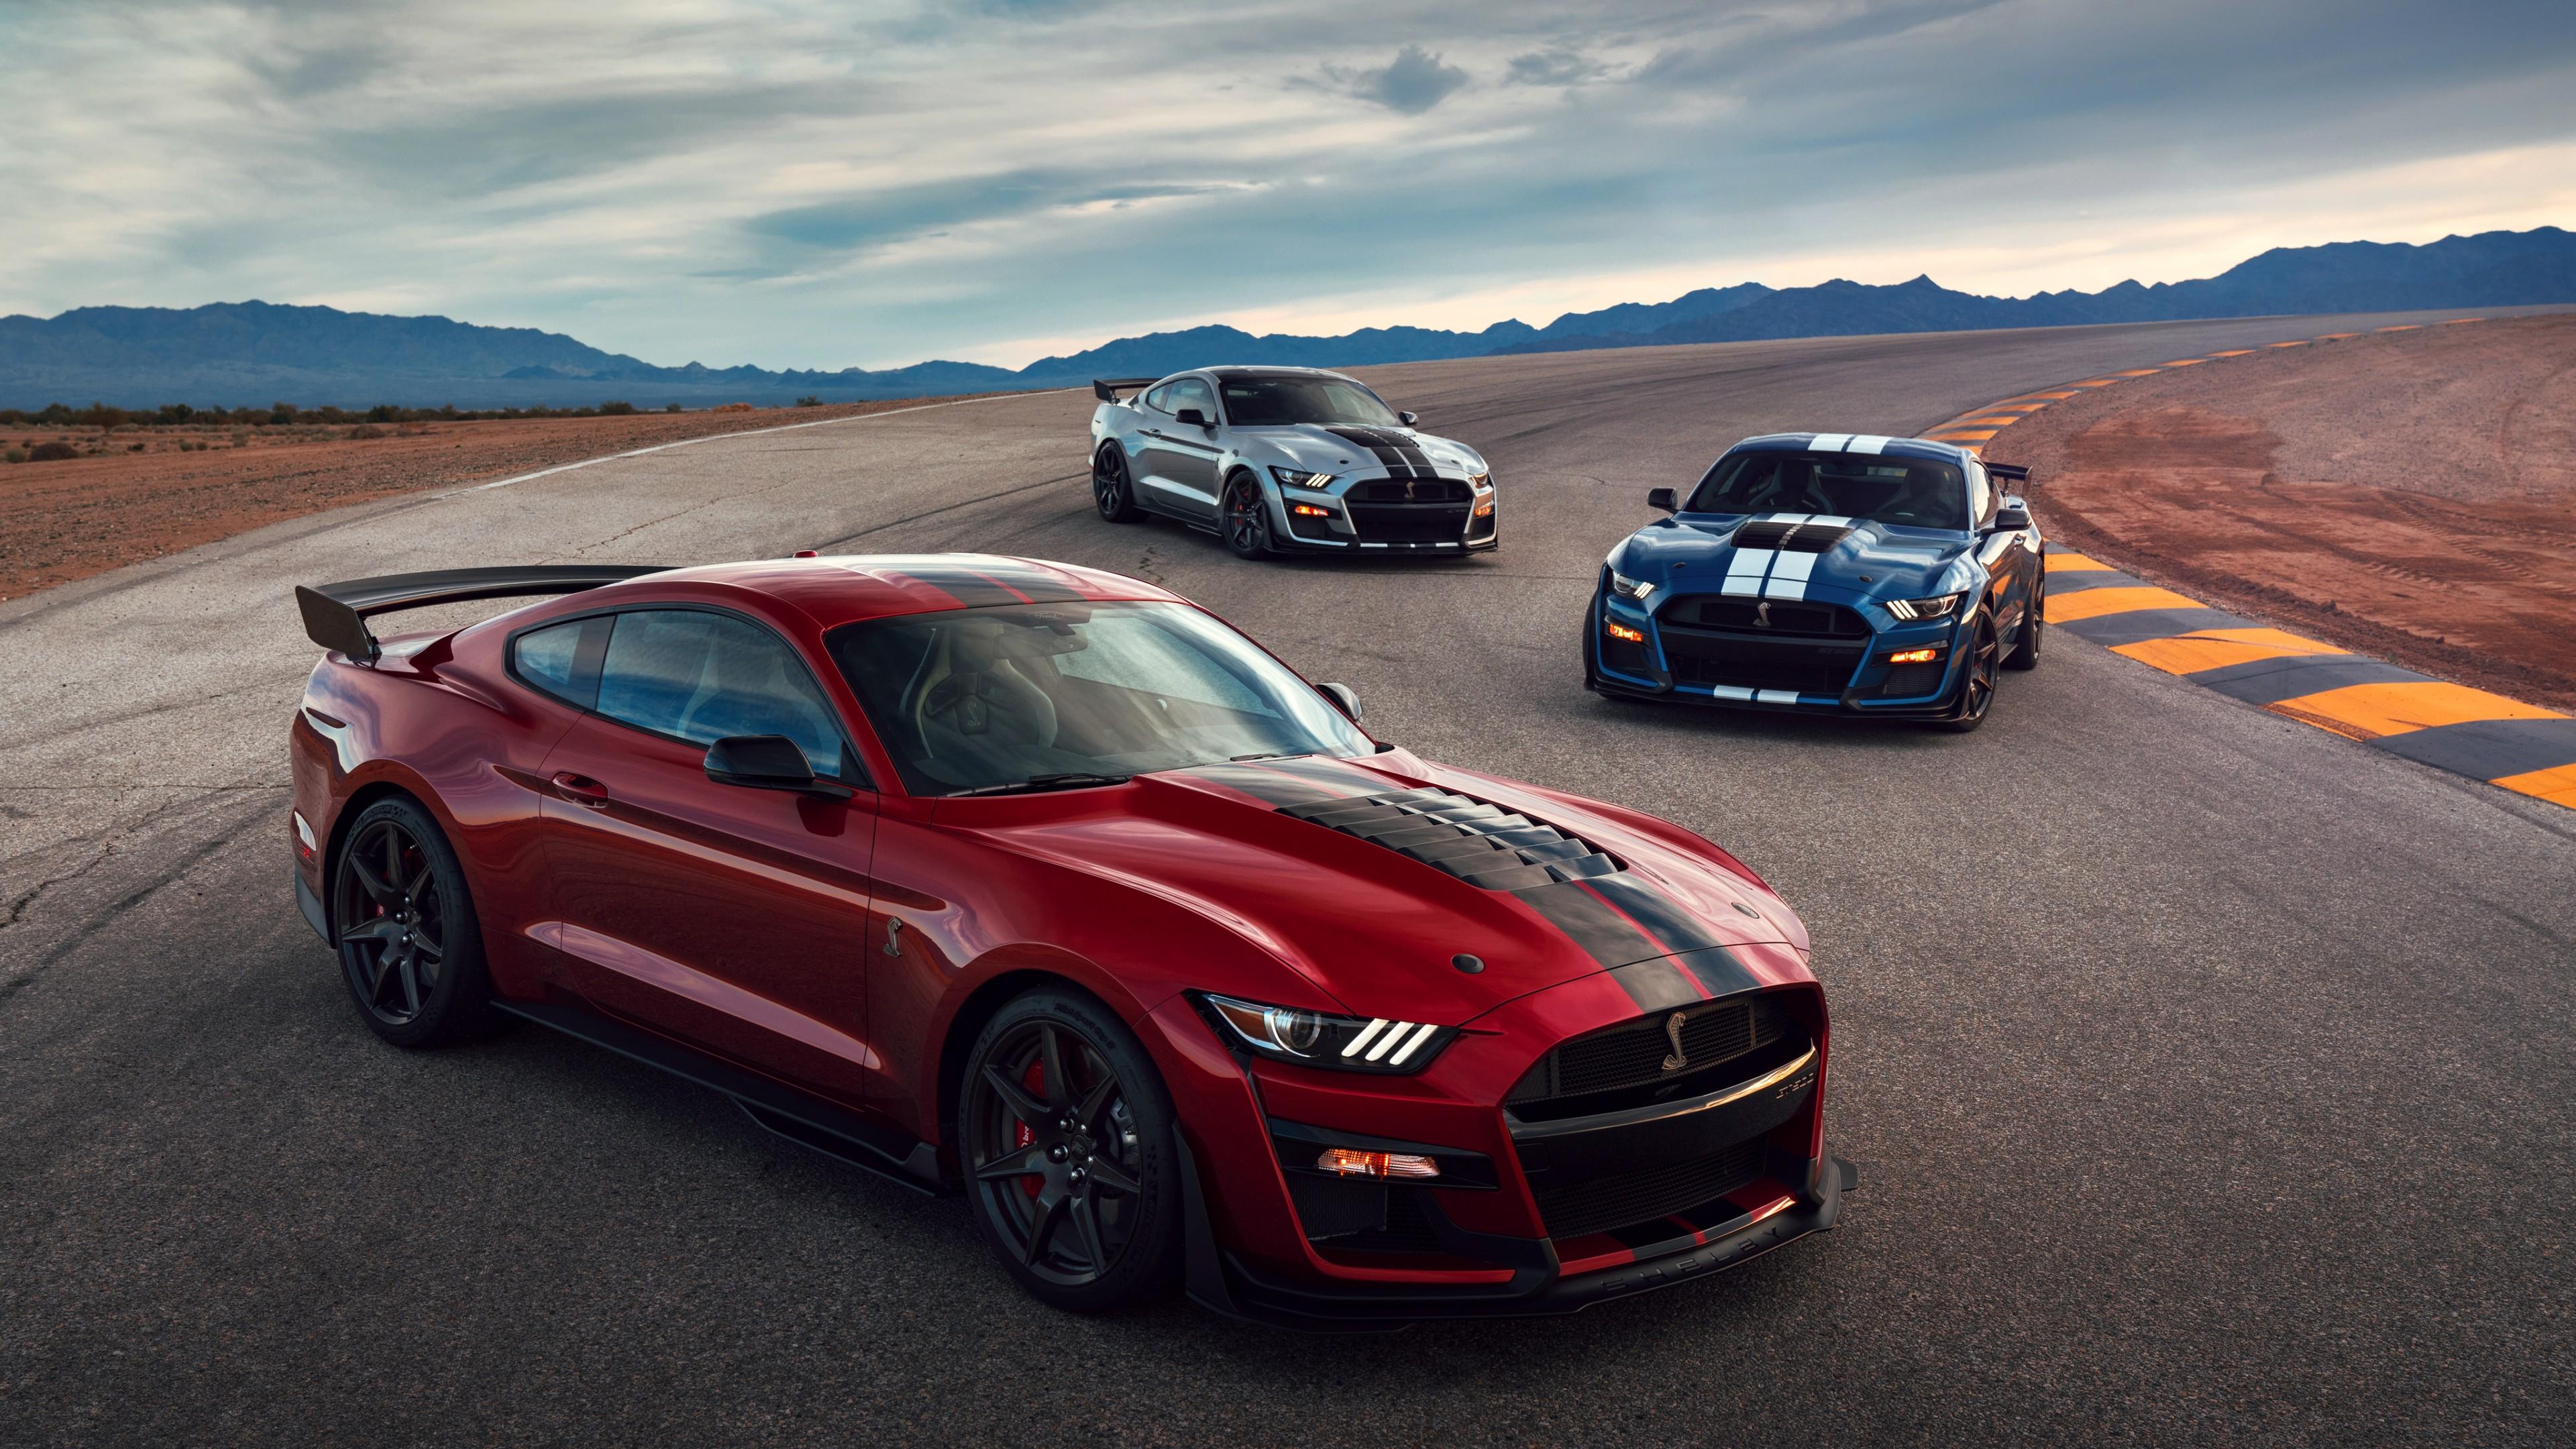 2020 Ford Mustang Shelby Gt500 4k 3 Wallpaper Hd Car